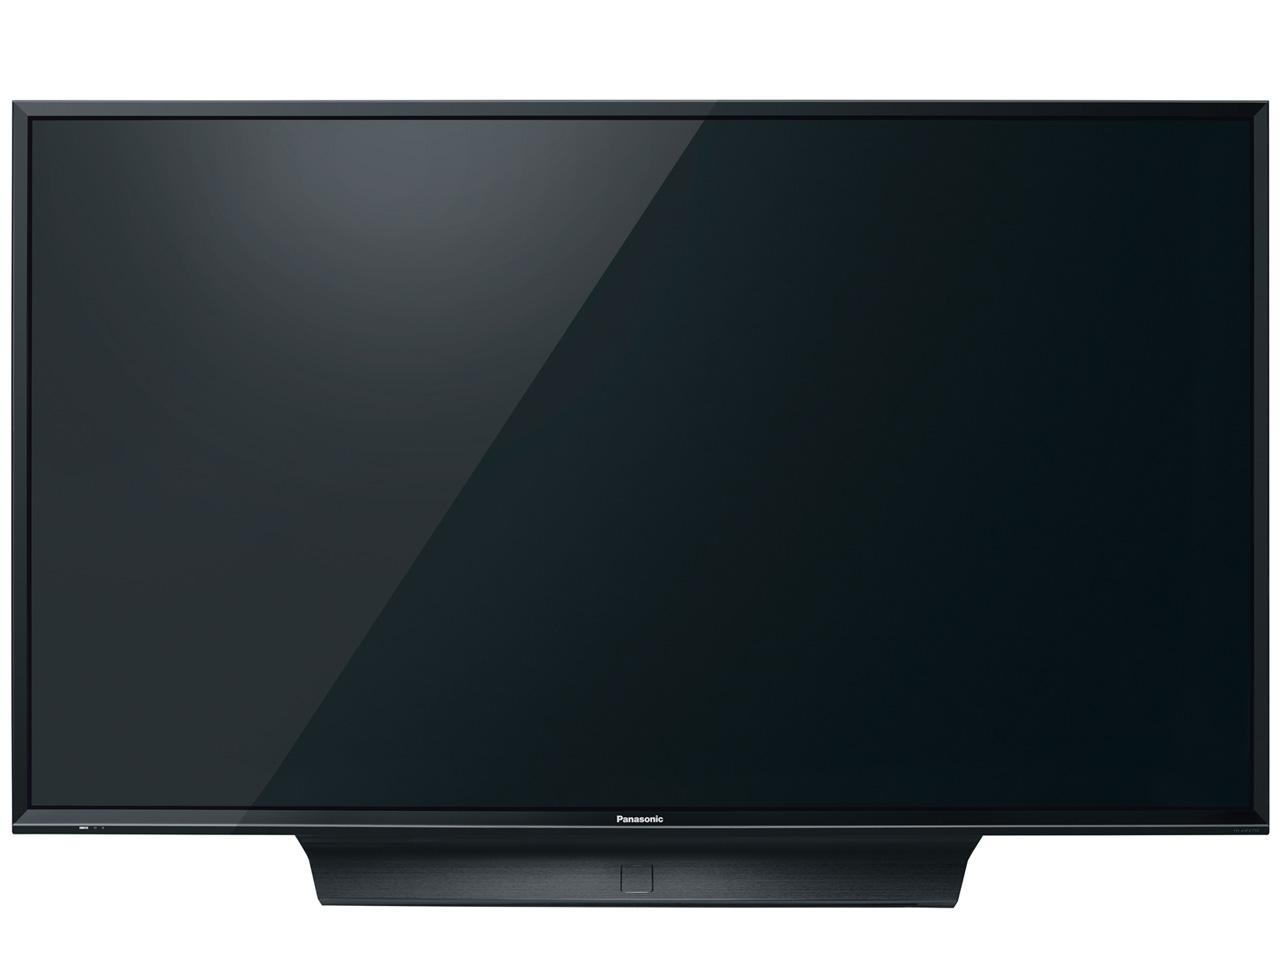 VIERA TH-43FX750 [43インチ] の製品画像